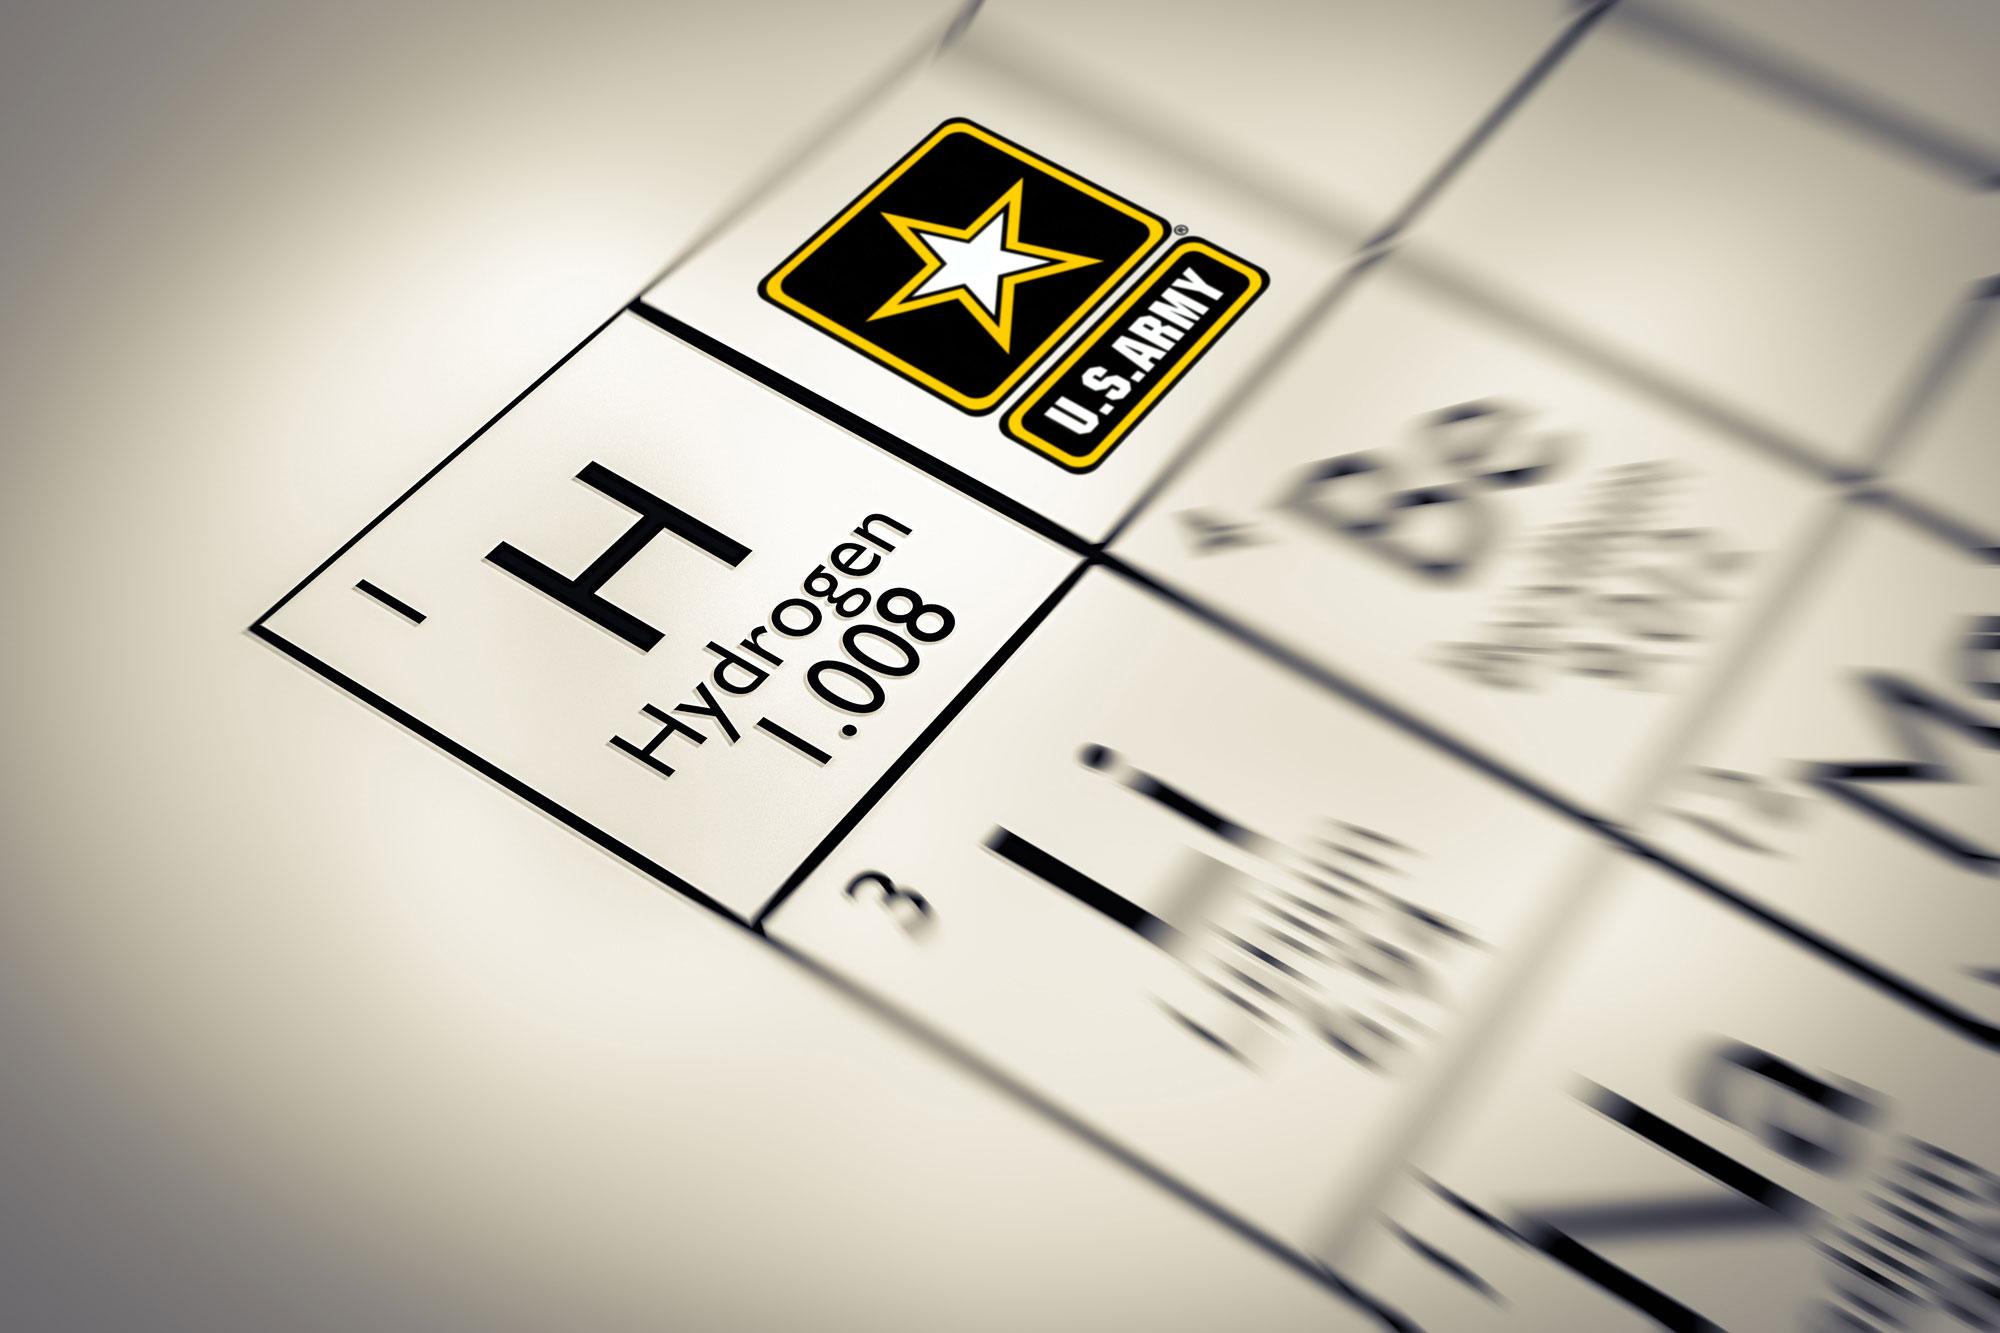 U.S Army Hydrogen